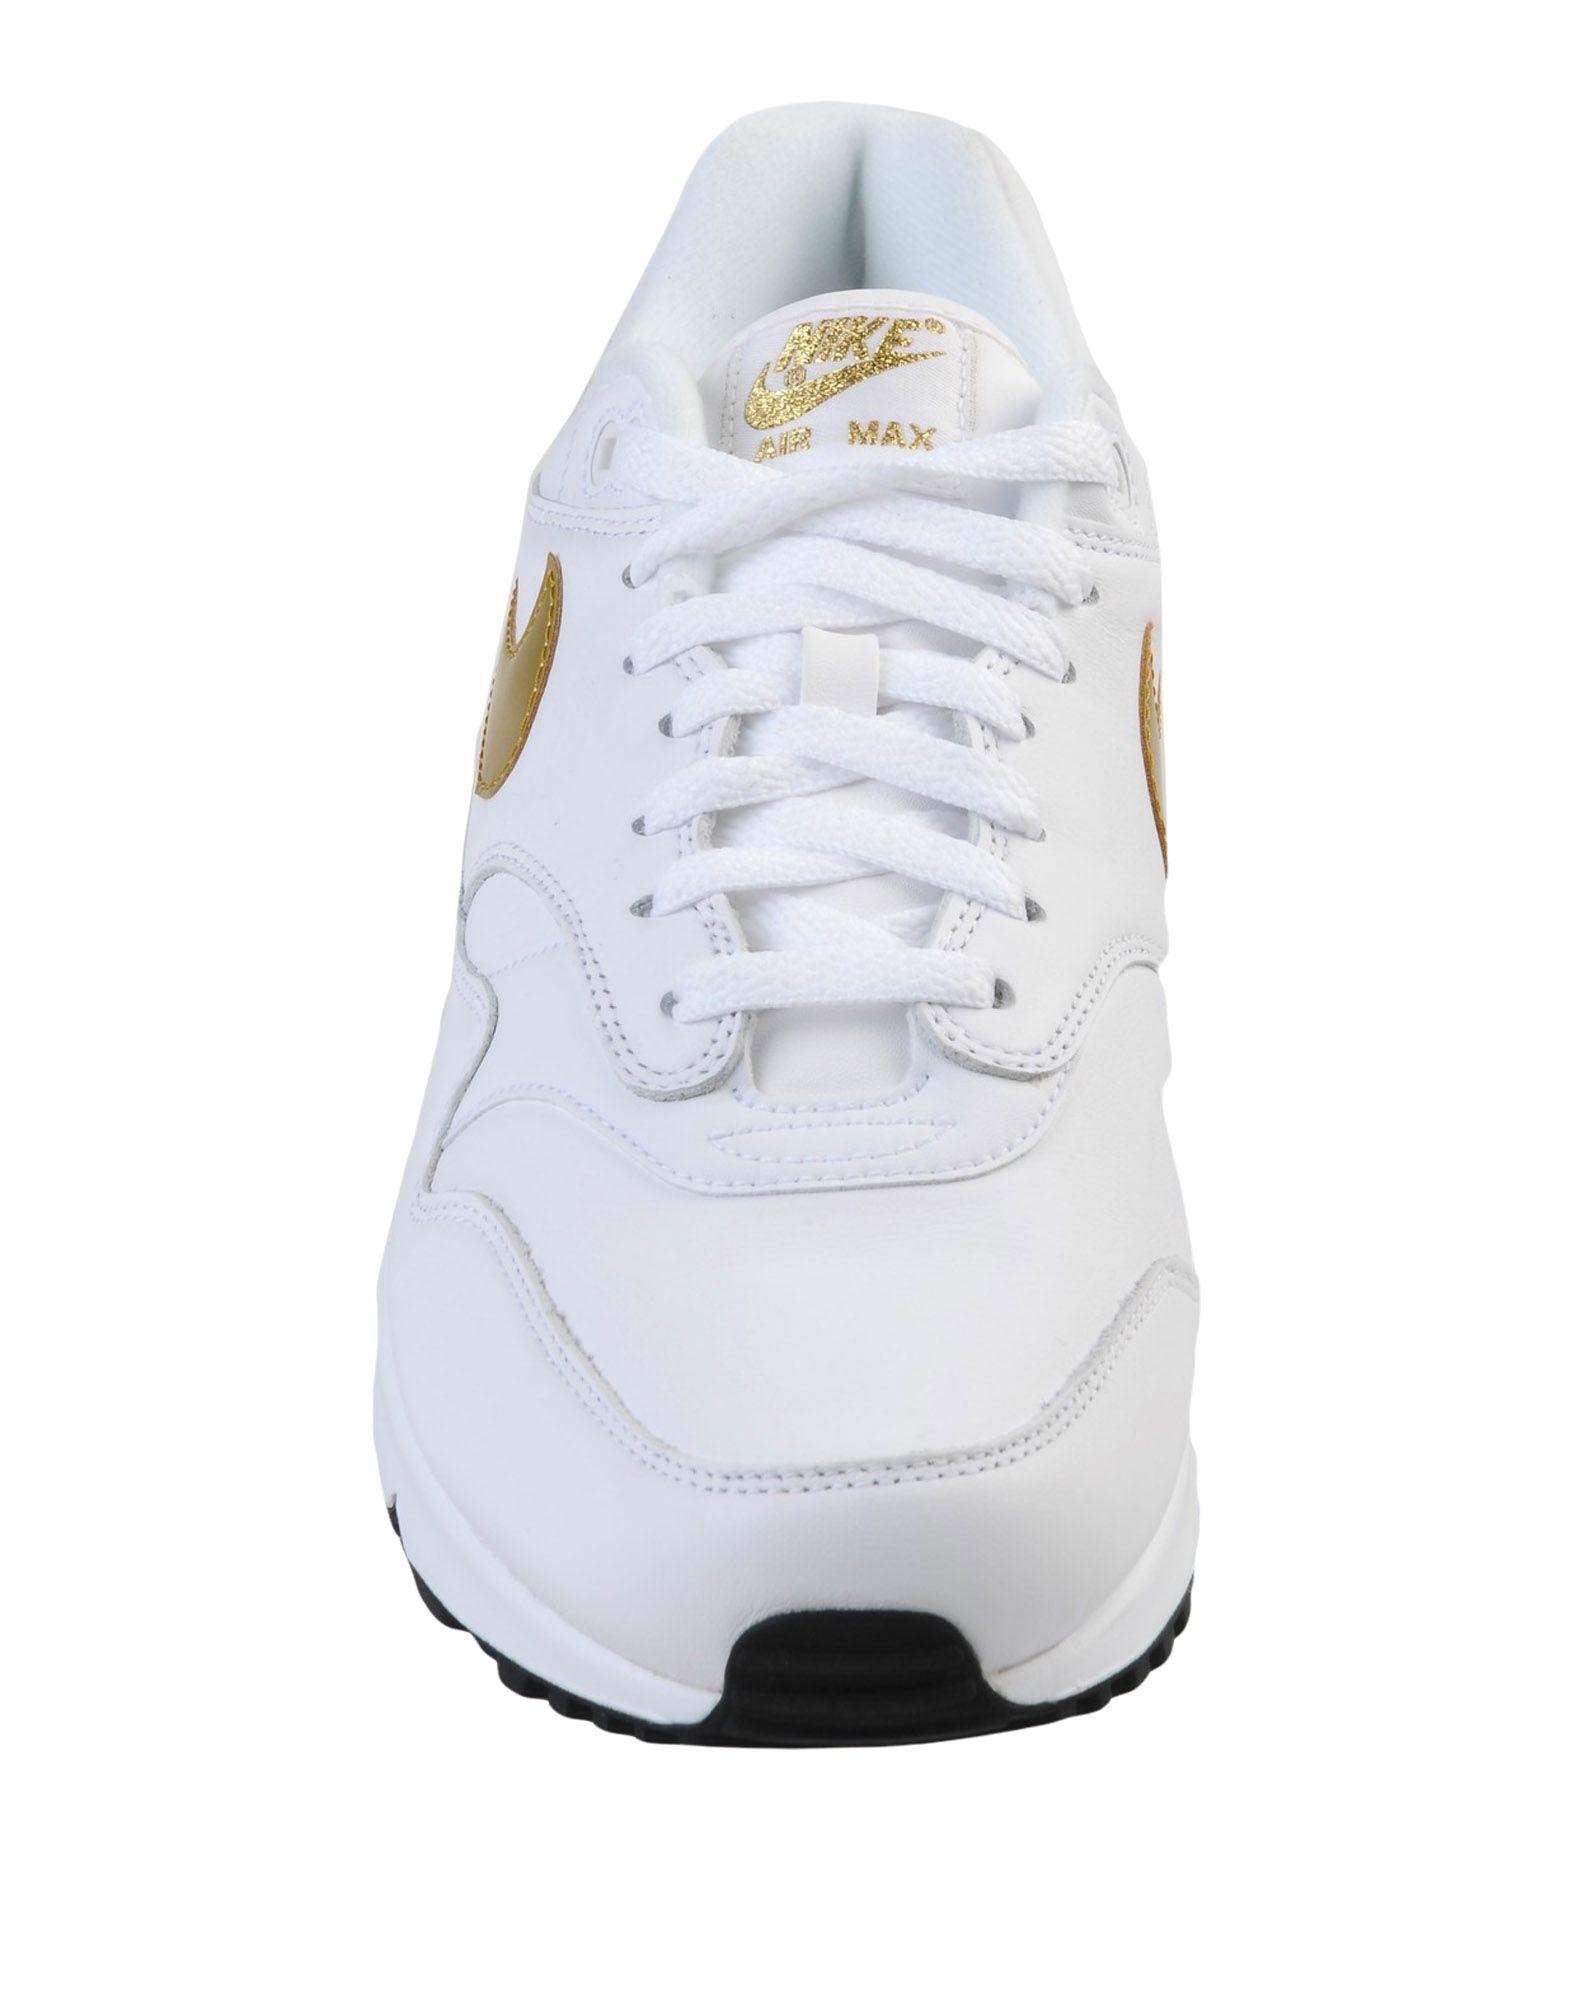 Nike Air Max 90/1 Gutes Preis-Leistungs-Verhältnis, es lohnt lohnt es sich 1394ba